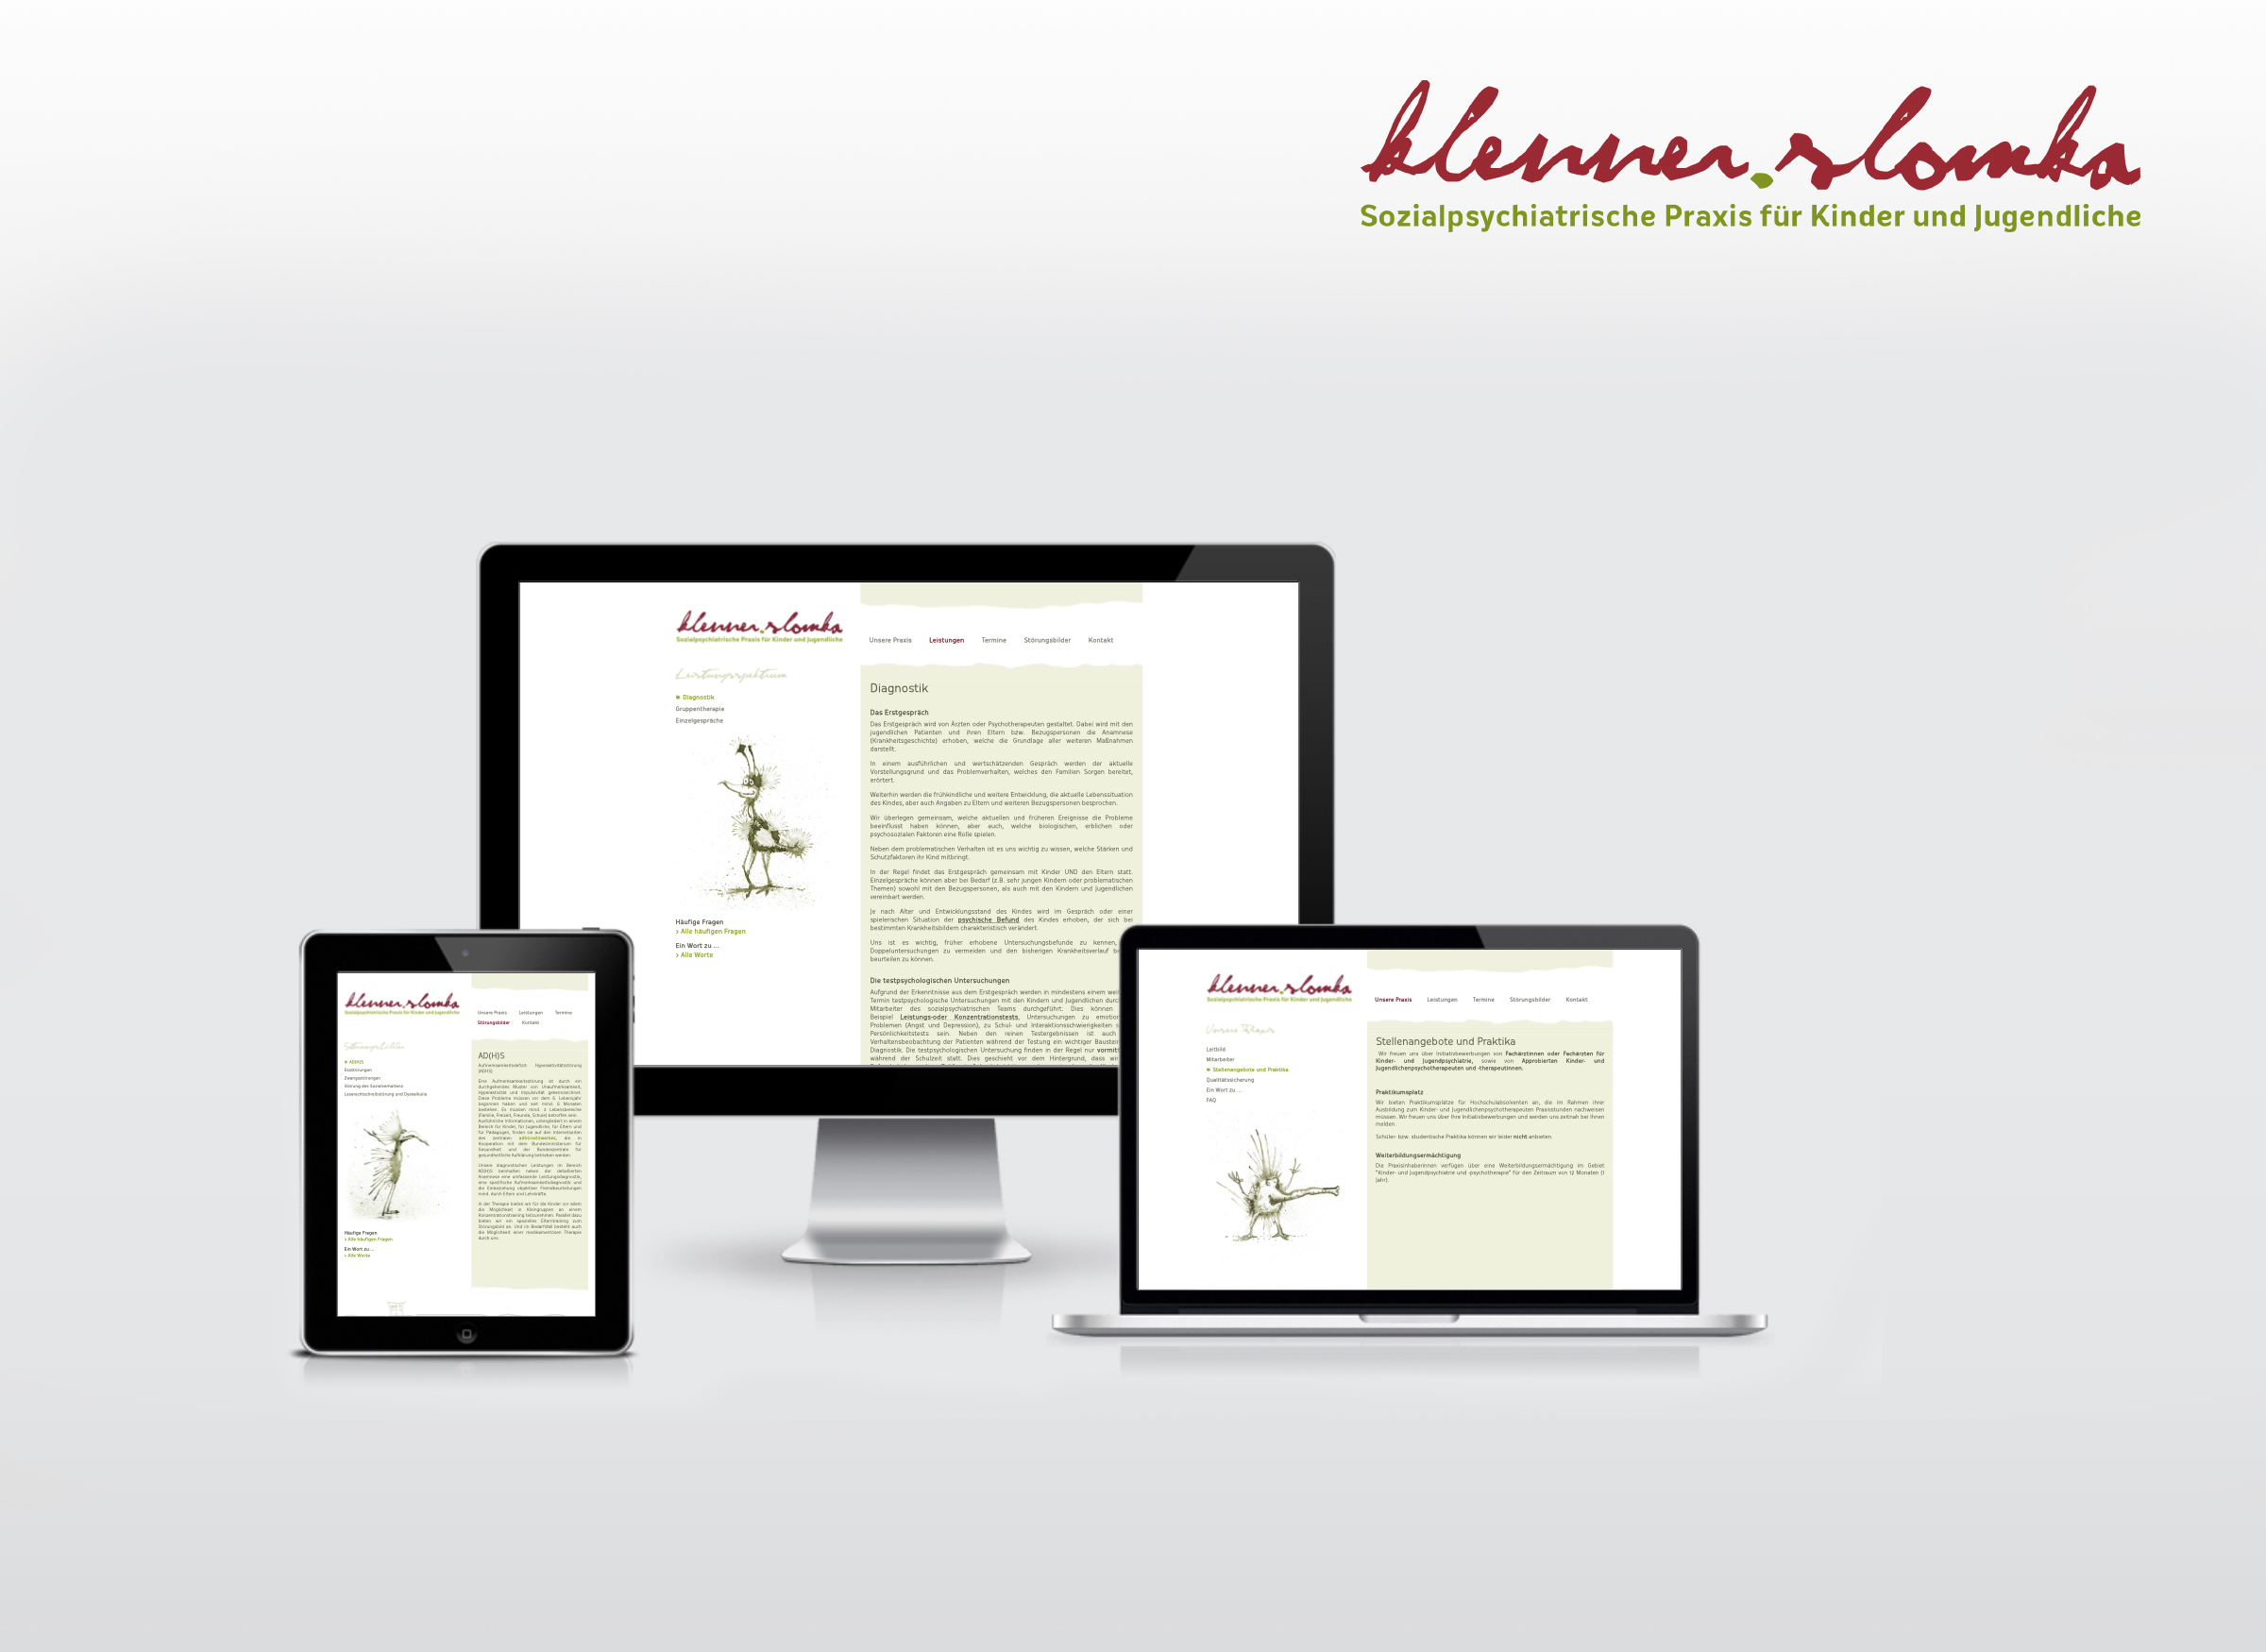 Website von Klenner Slomaka